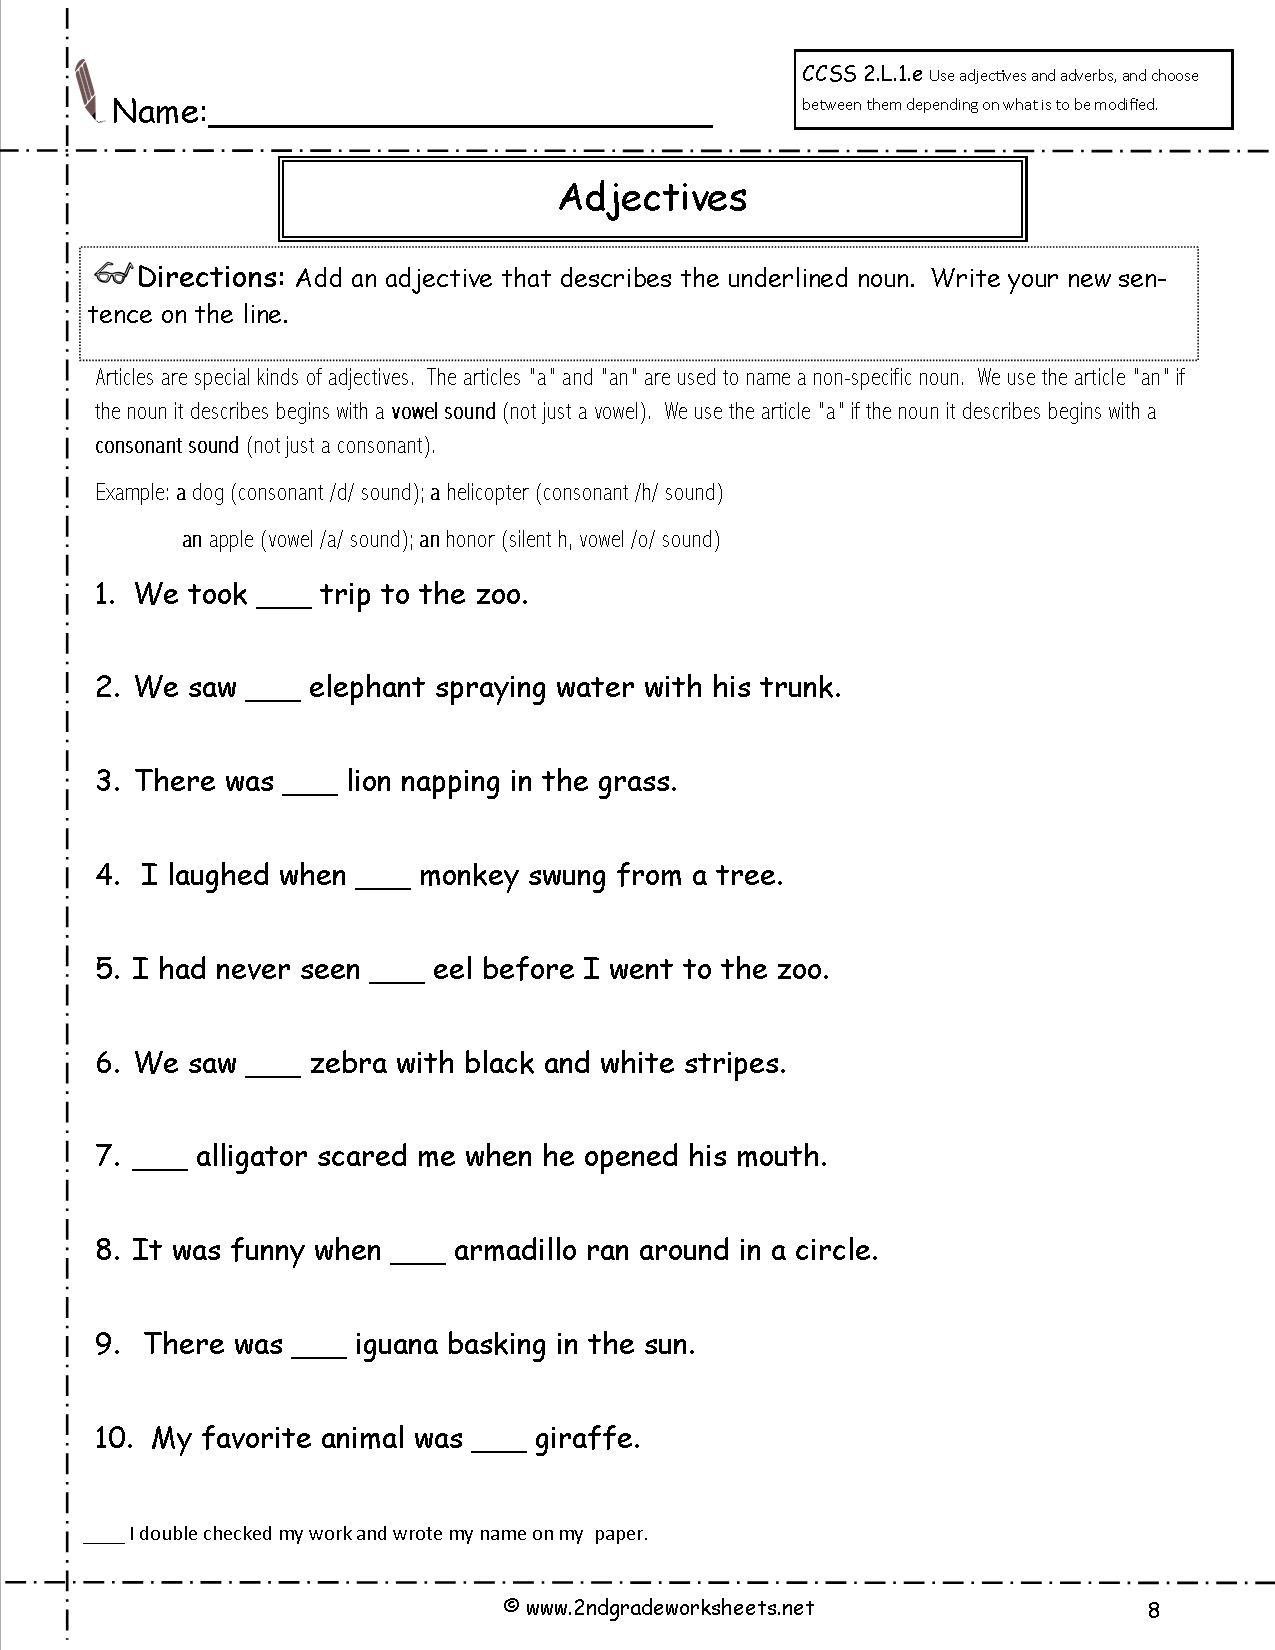 Free Language/grammar Worksheets And Printouts | Free Printable Language Worksheets